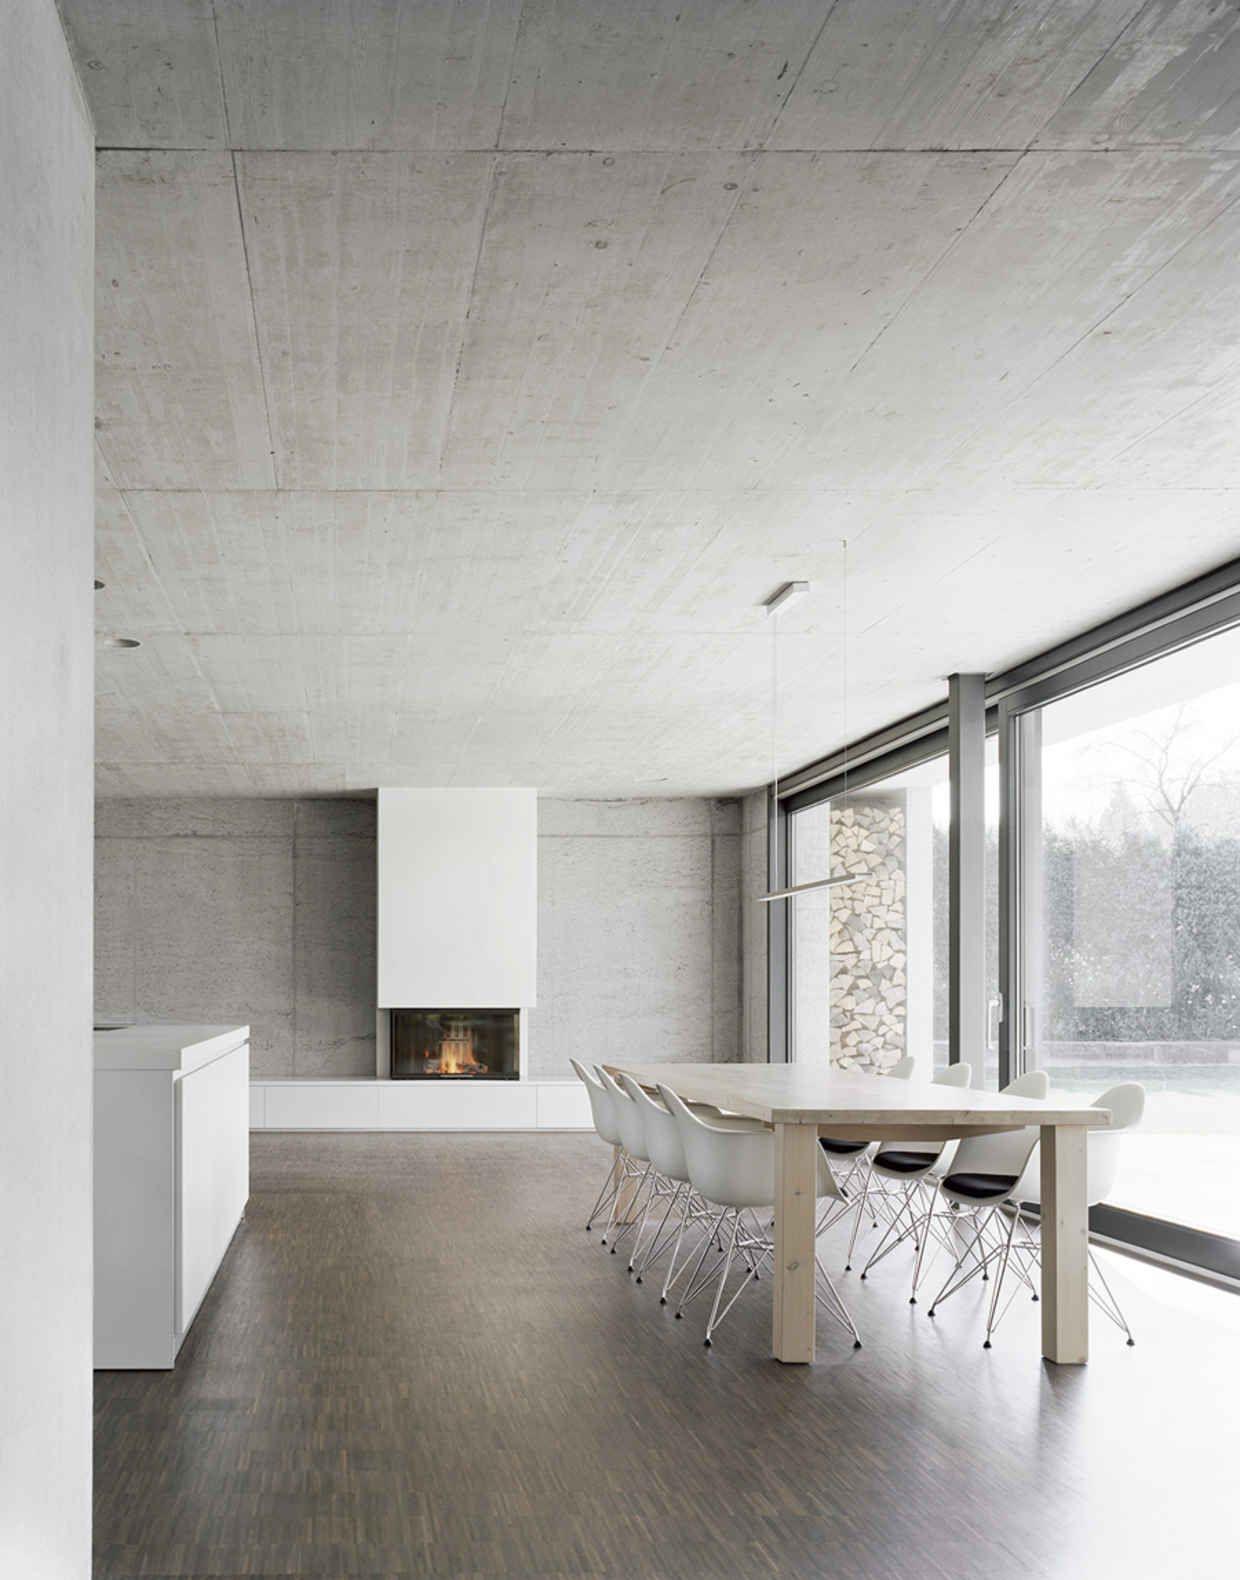 40 Minimalist Style Interiors Minimalism Interior Minimalist Interior Design Interior Design